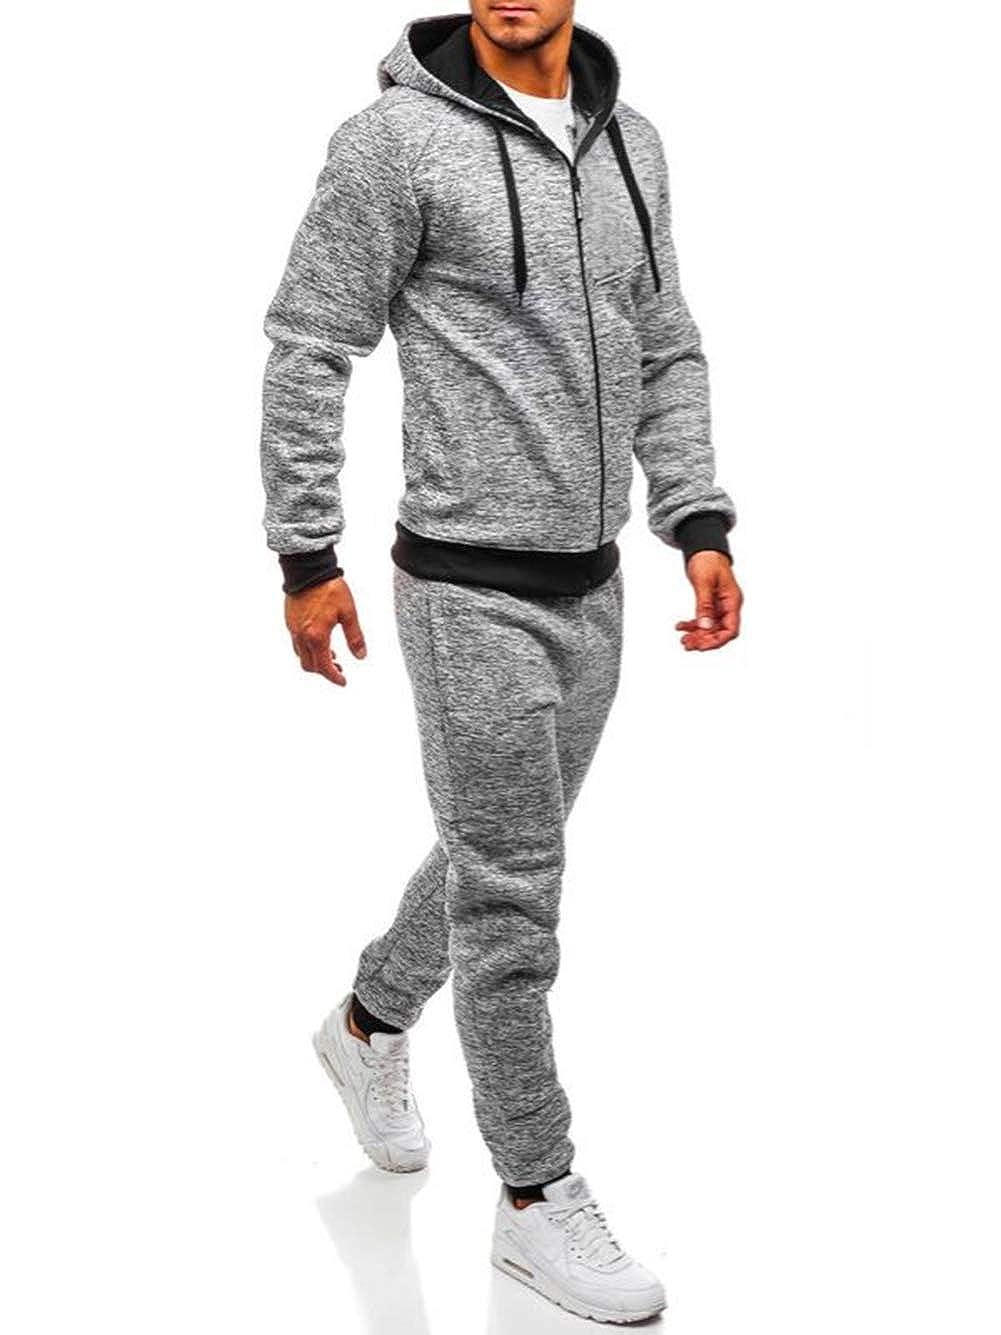 Herren Tarnfarbe Trainingsanzug Set Kapuze Top Joggen Jogginghosen Sweat Hose